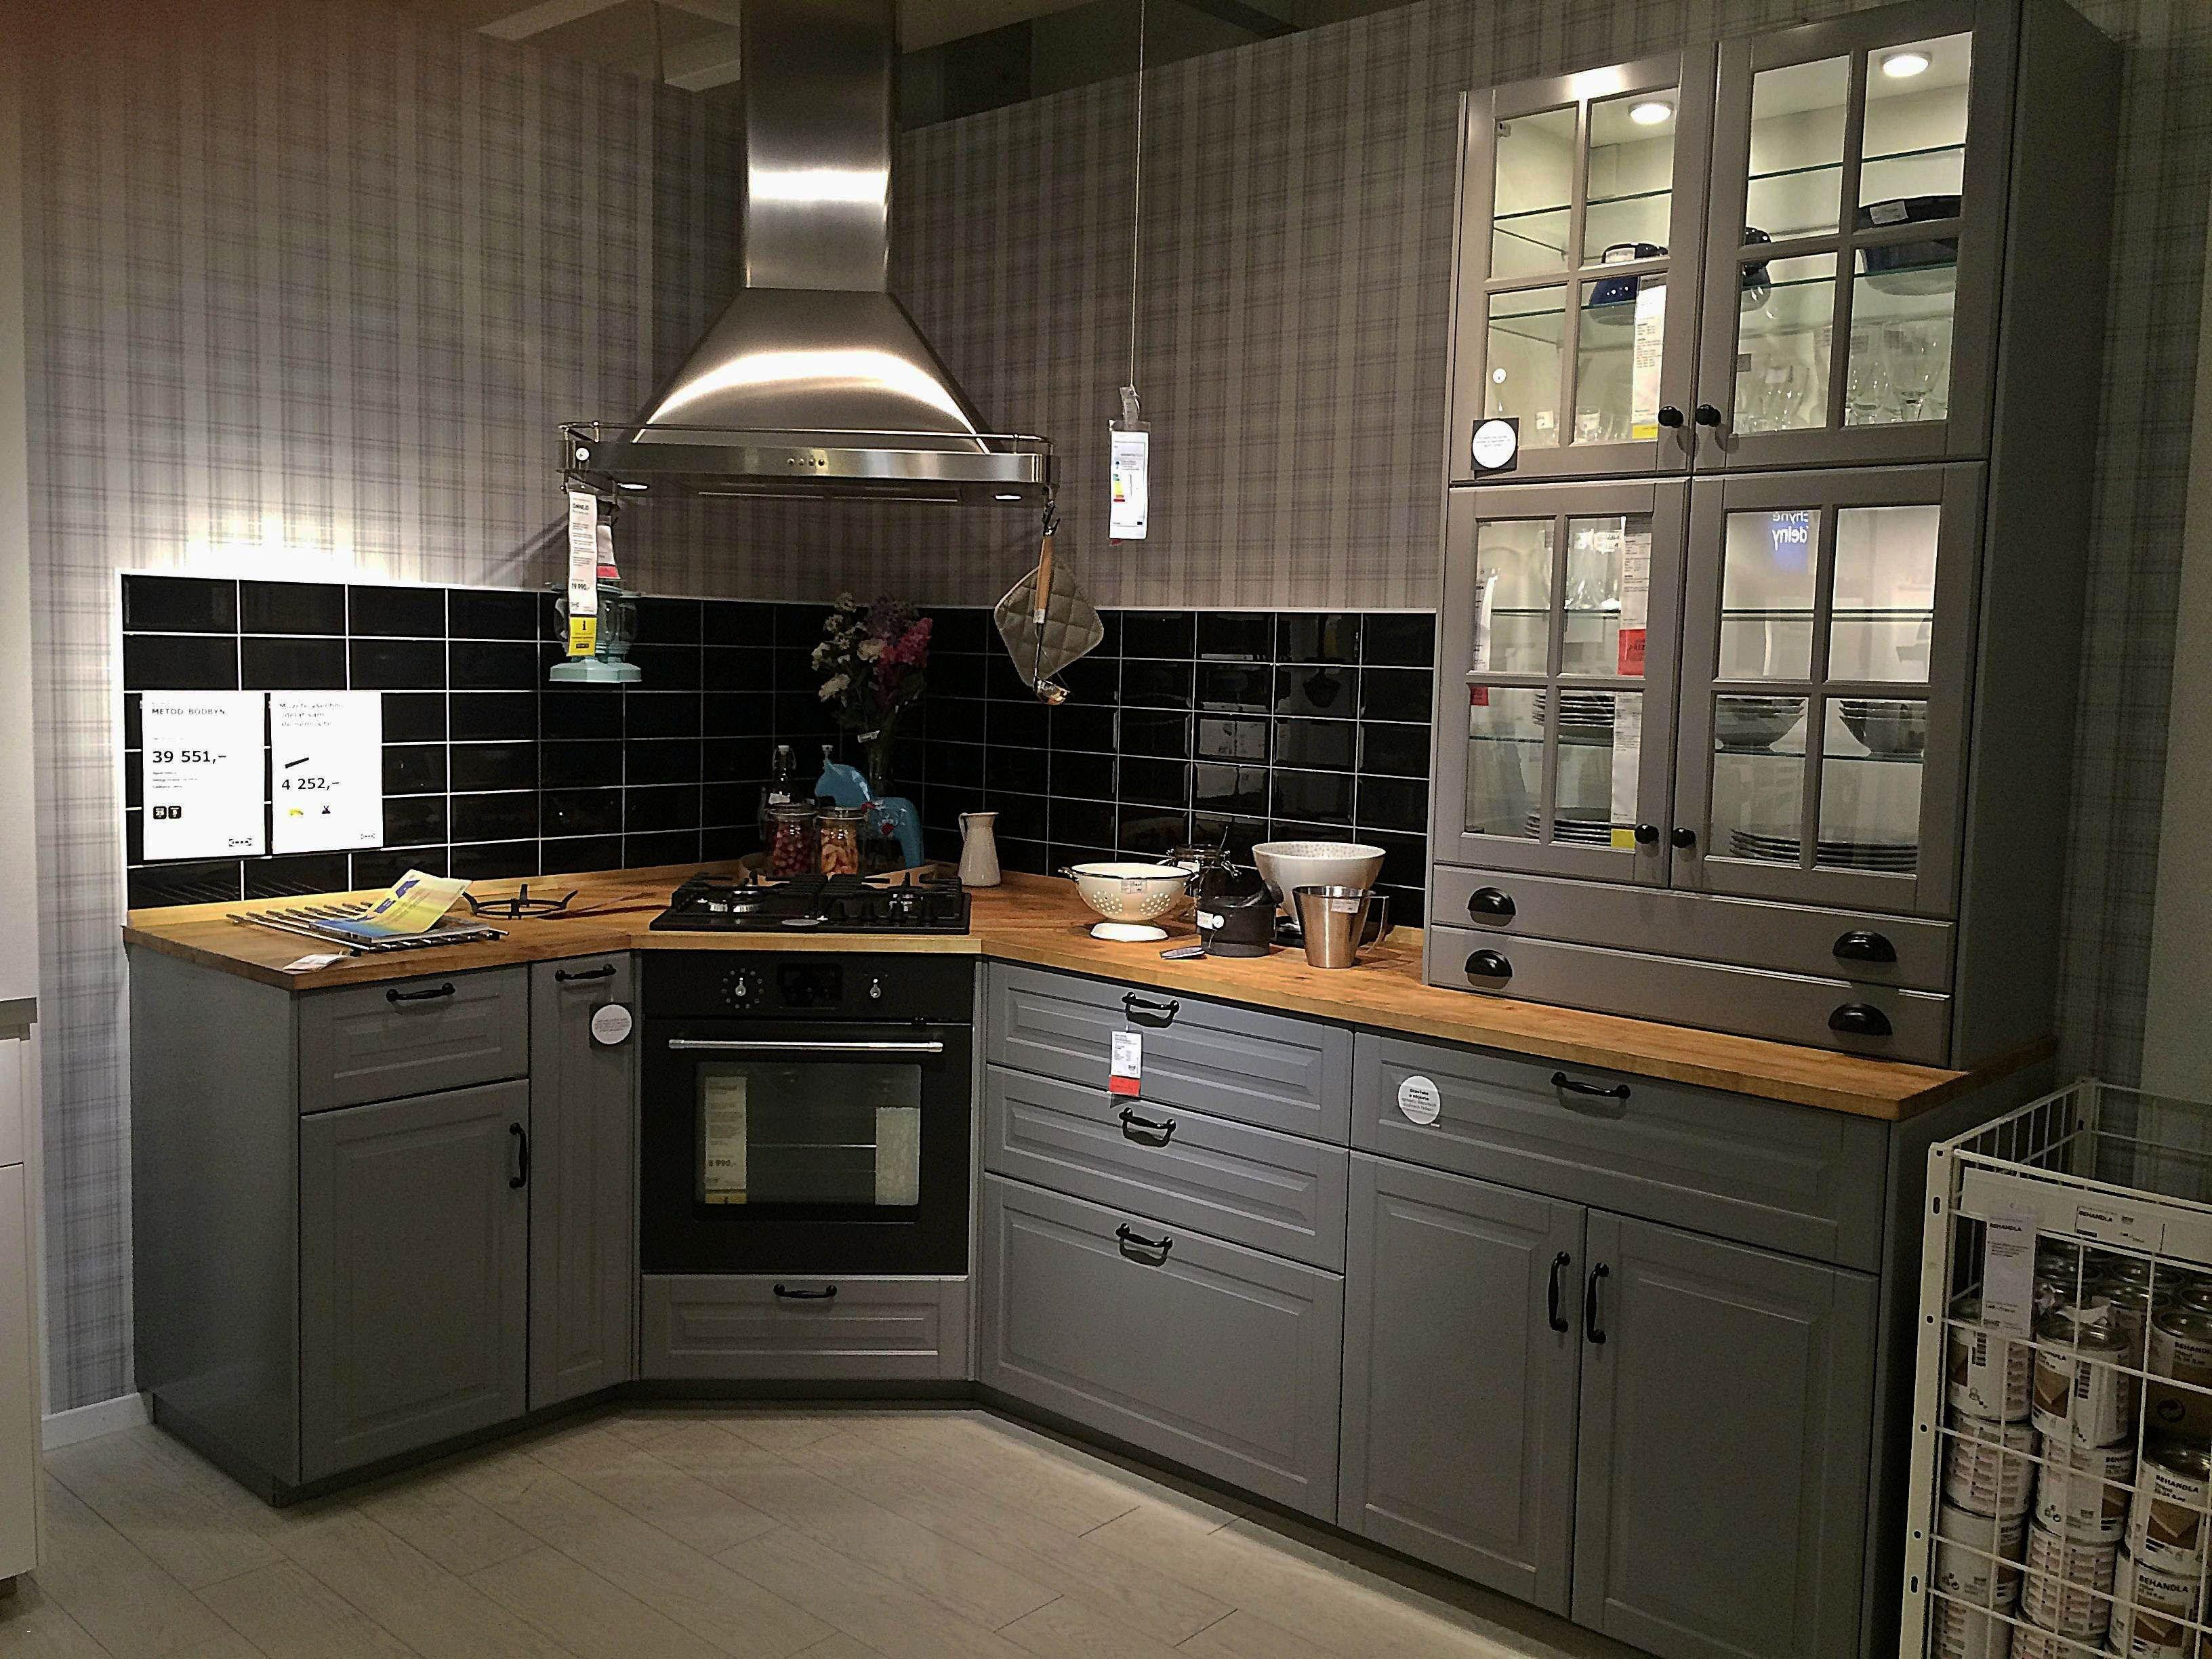 Fascinating Ikea Kitchen Cabinets Sizes Only In Zelta Home Design Ikea Bodbyn Kitchen Ikea Metod Kitchen Kitchen Interior